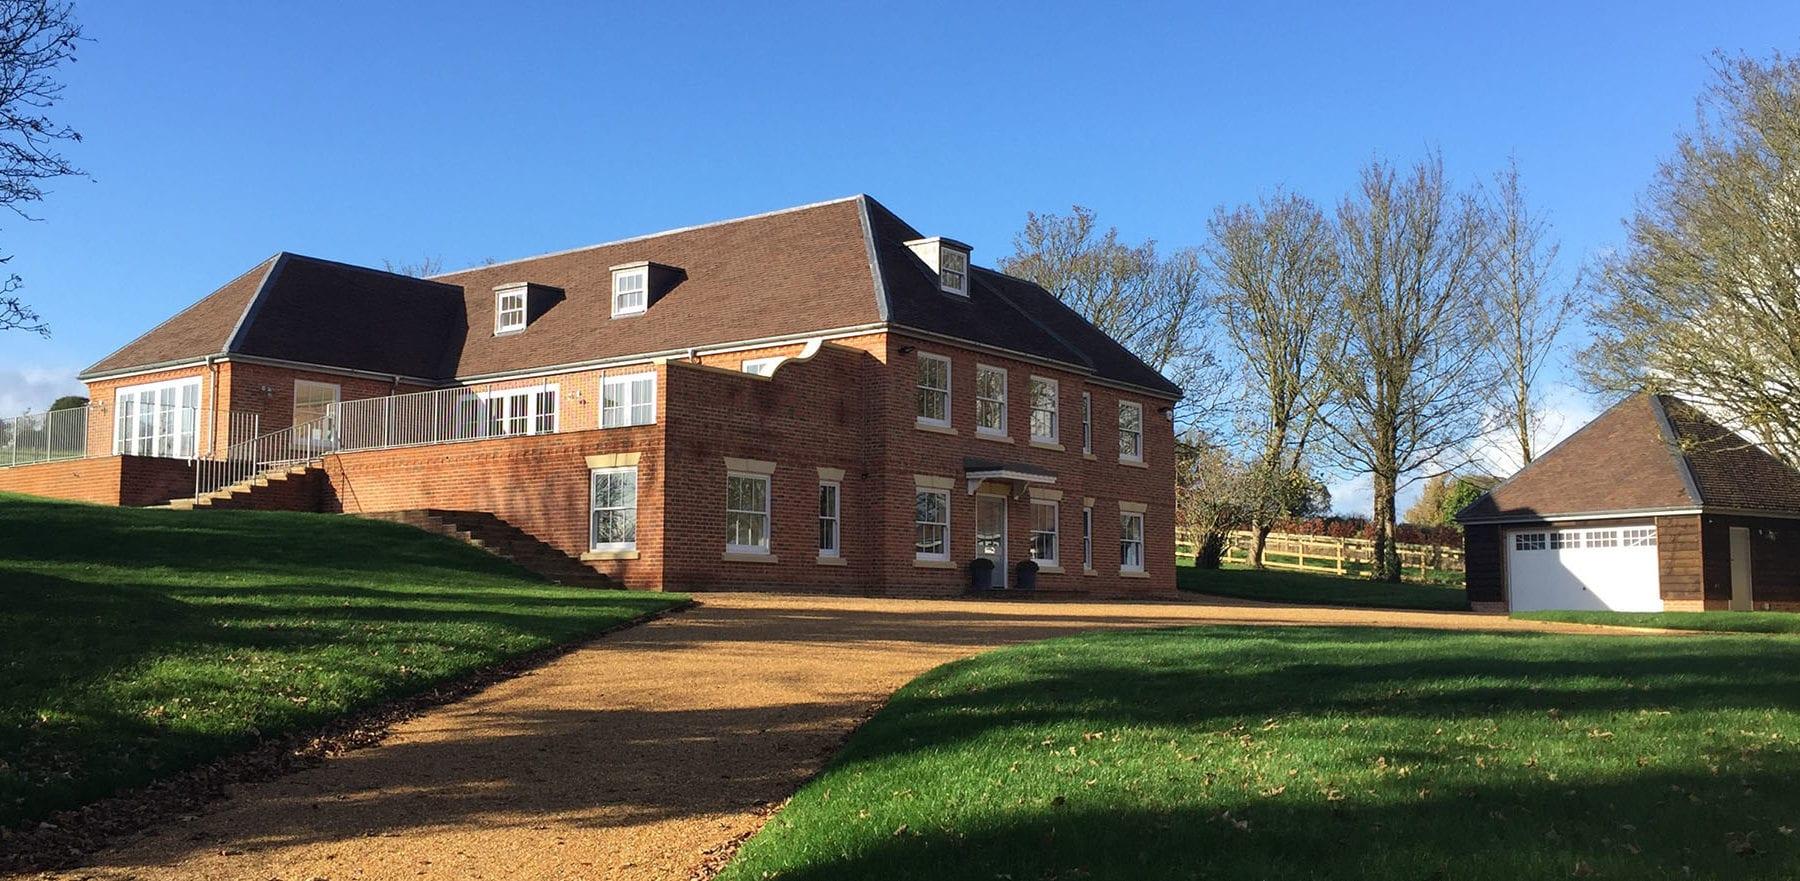 Lifestiles - Handmade Restoration Clay Roof Tiles - Creed, England 6